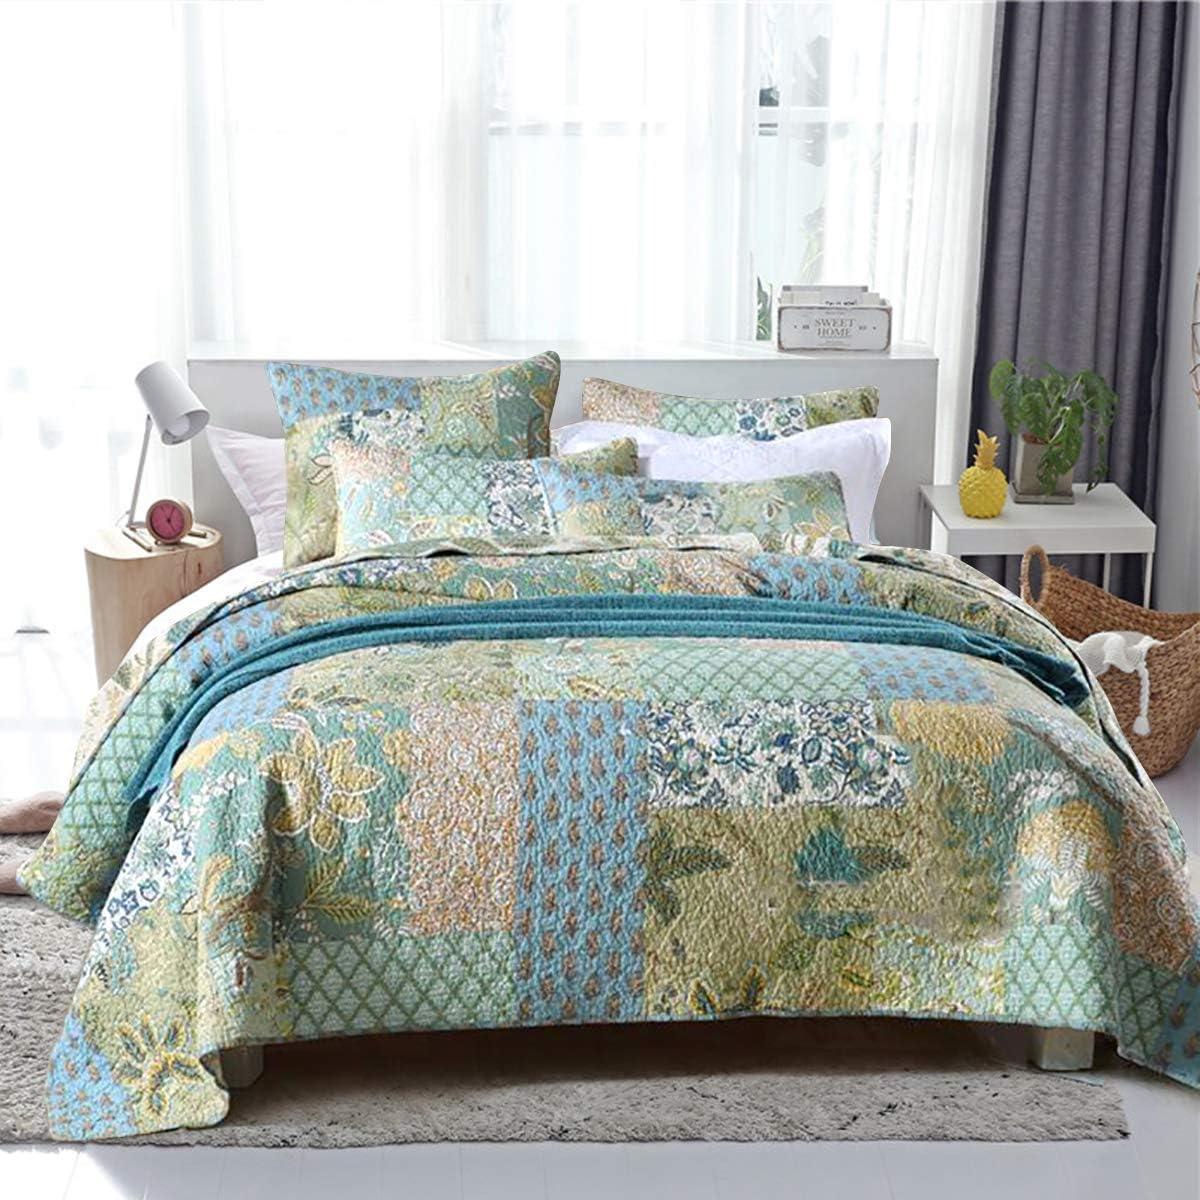 Bohemian Outlet SALE bedspreads King Size Quilt Reversible Cotton Sets 100% 2021 model